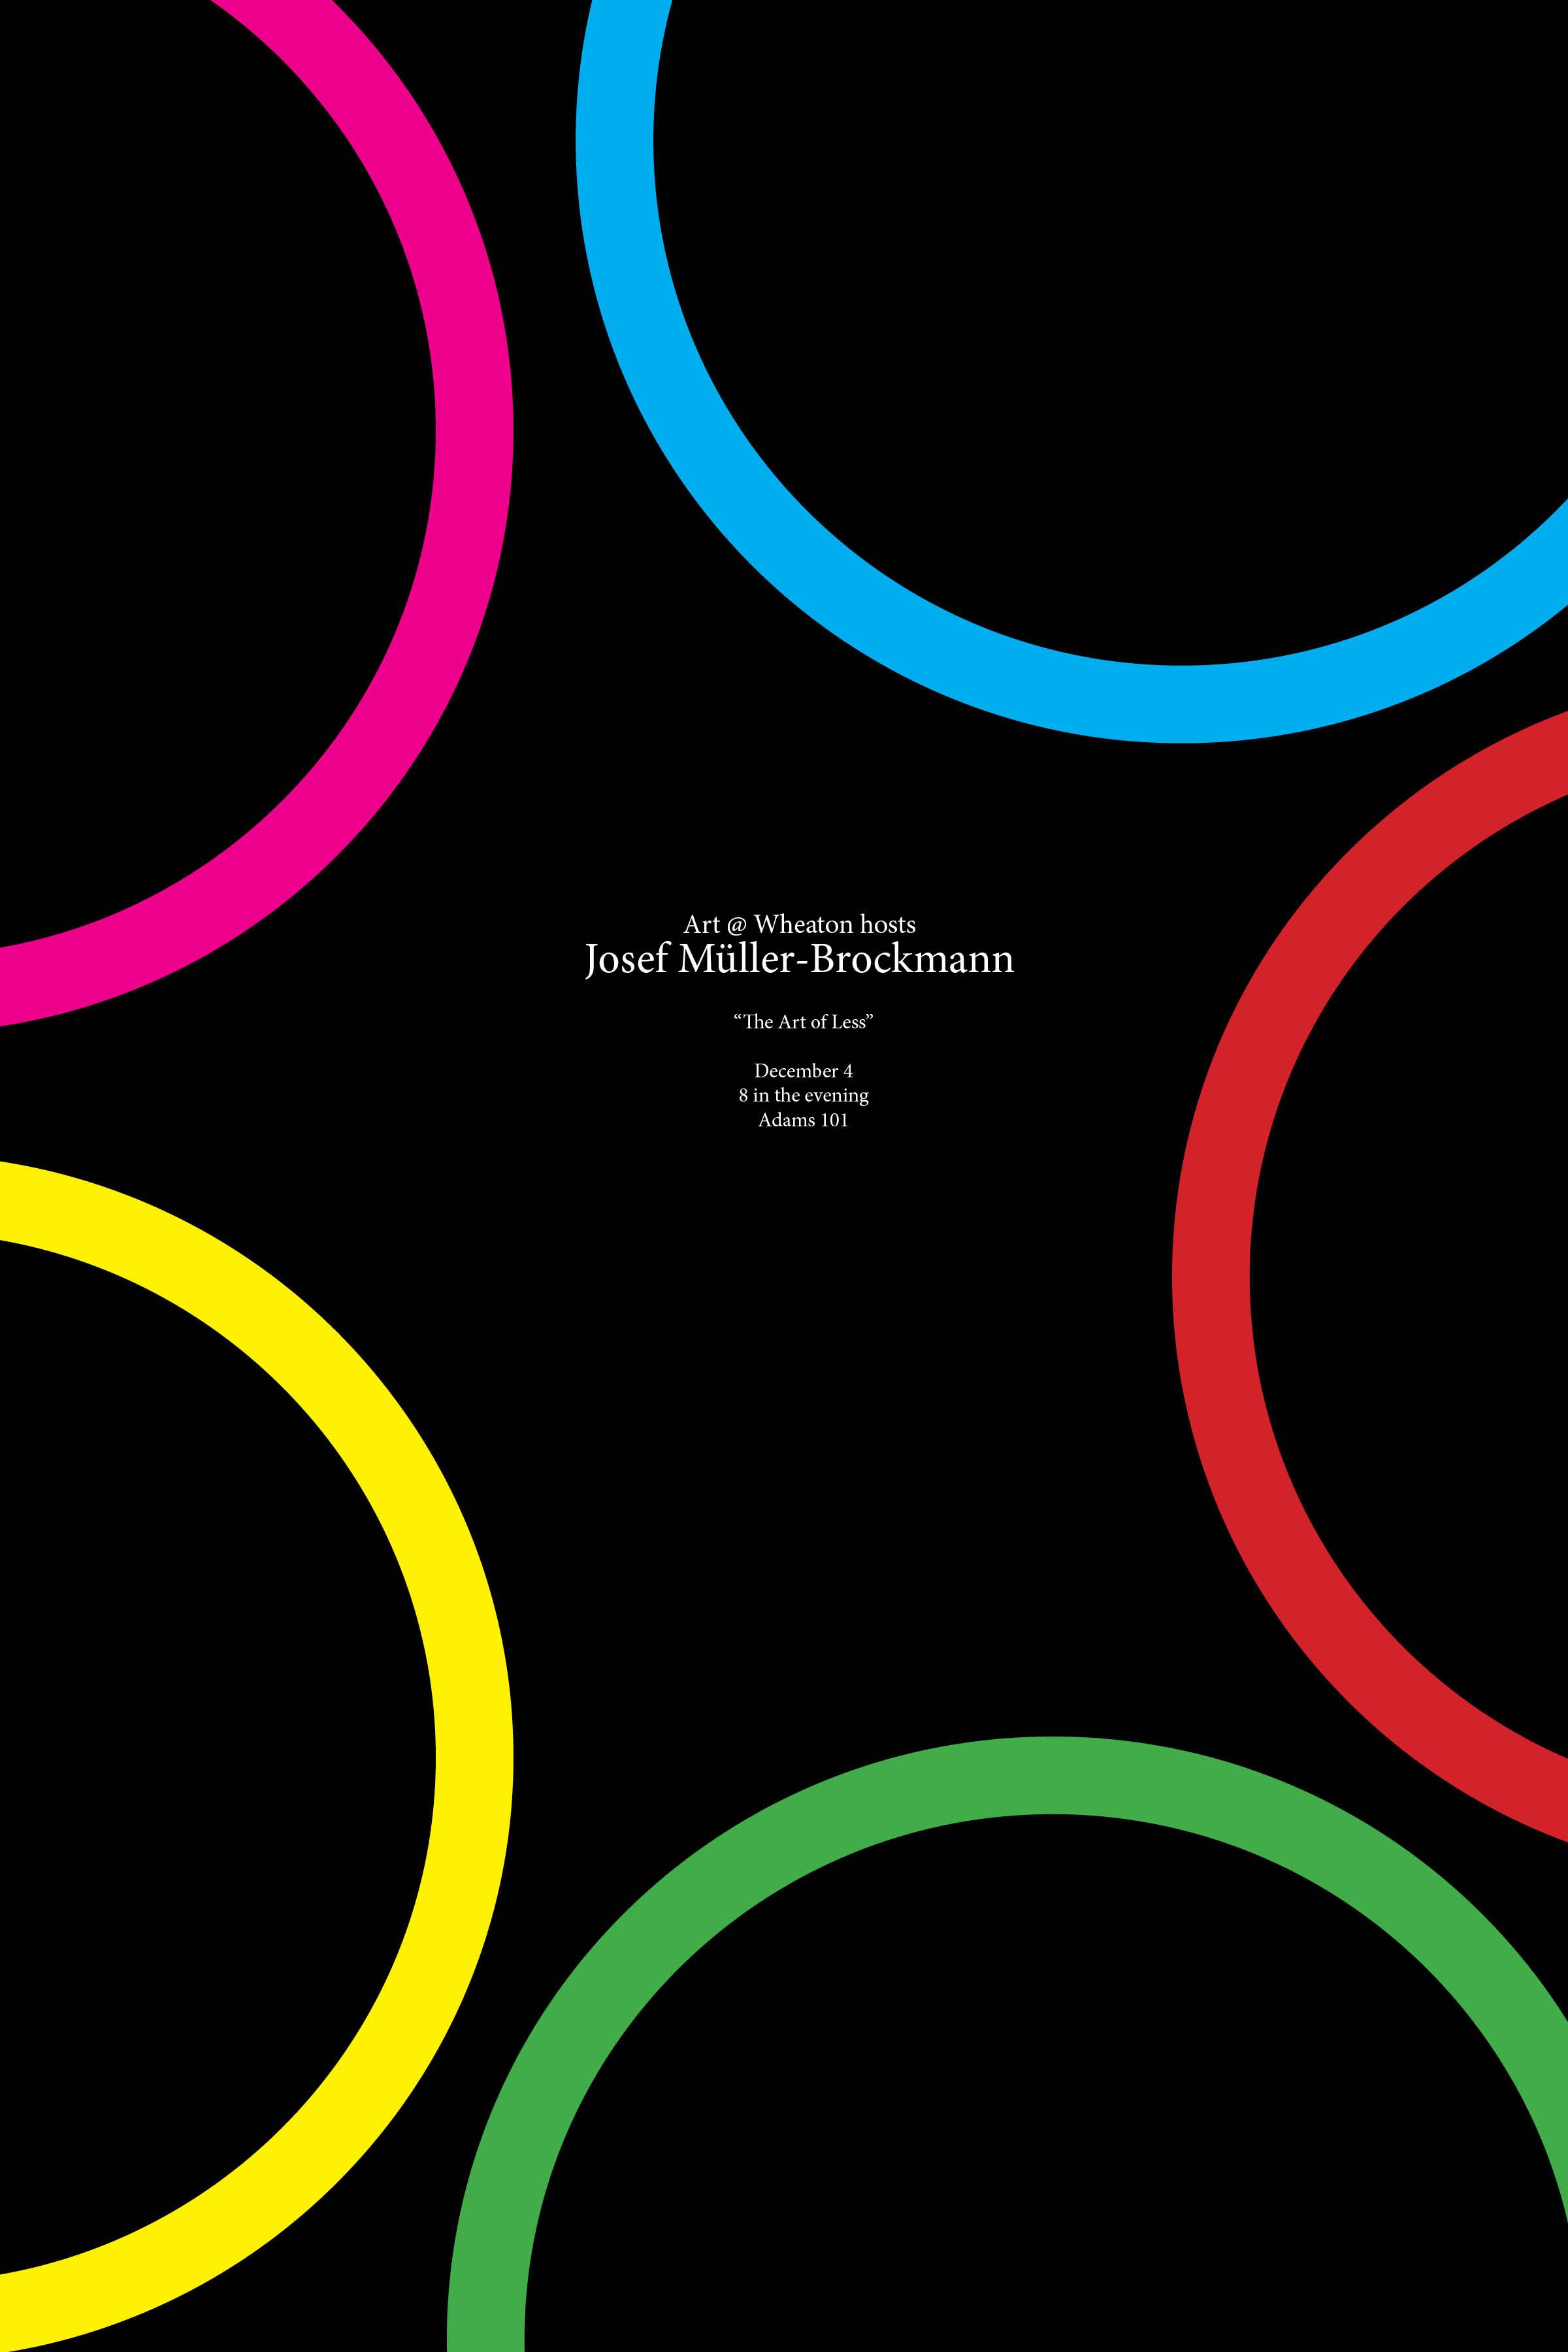 Josef Muller-Brockmann Poster